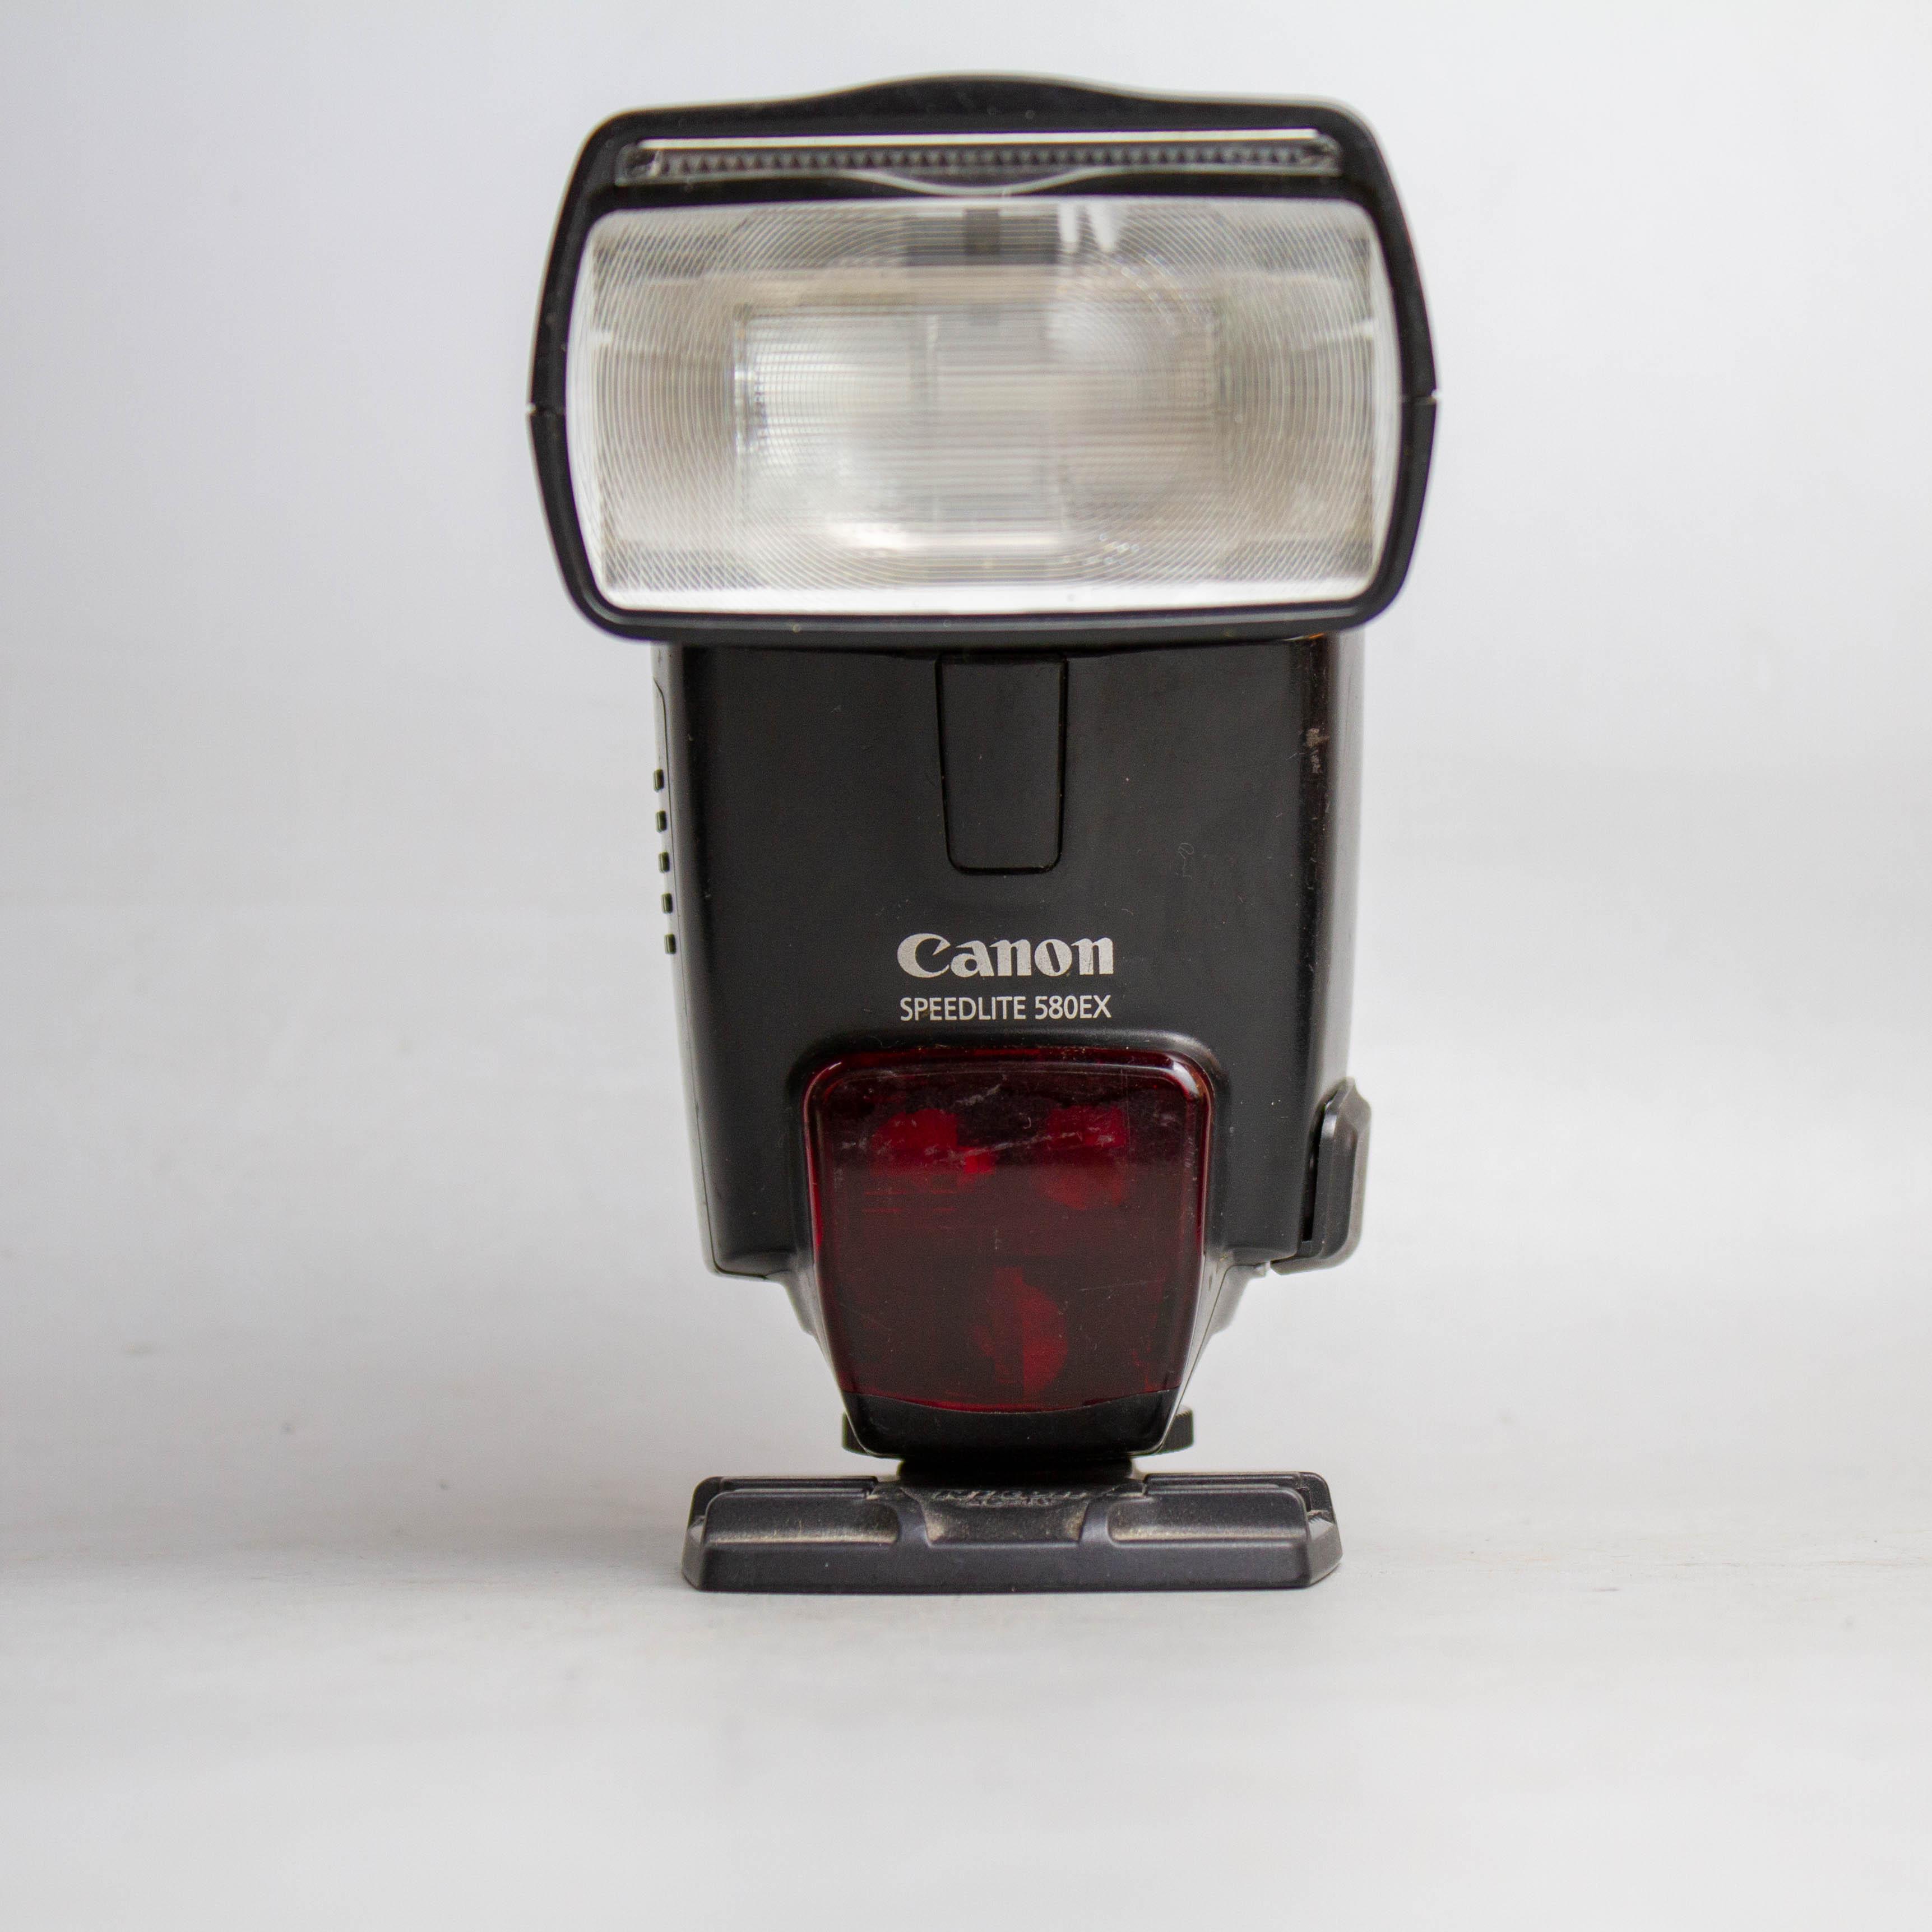 canon-speedlite-580ex-speedlite-flash-11403